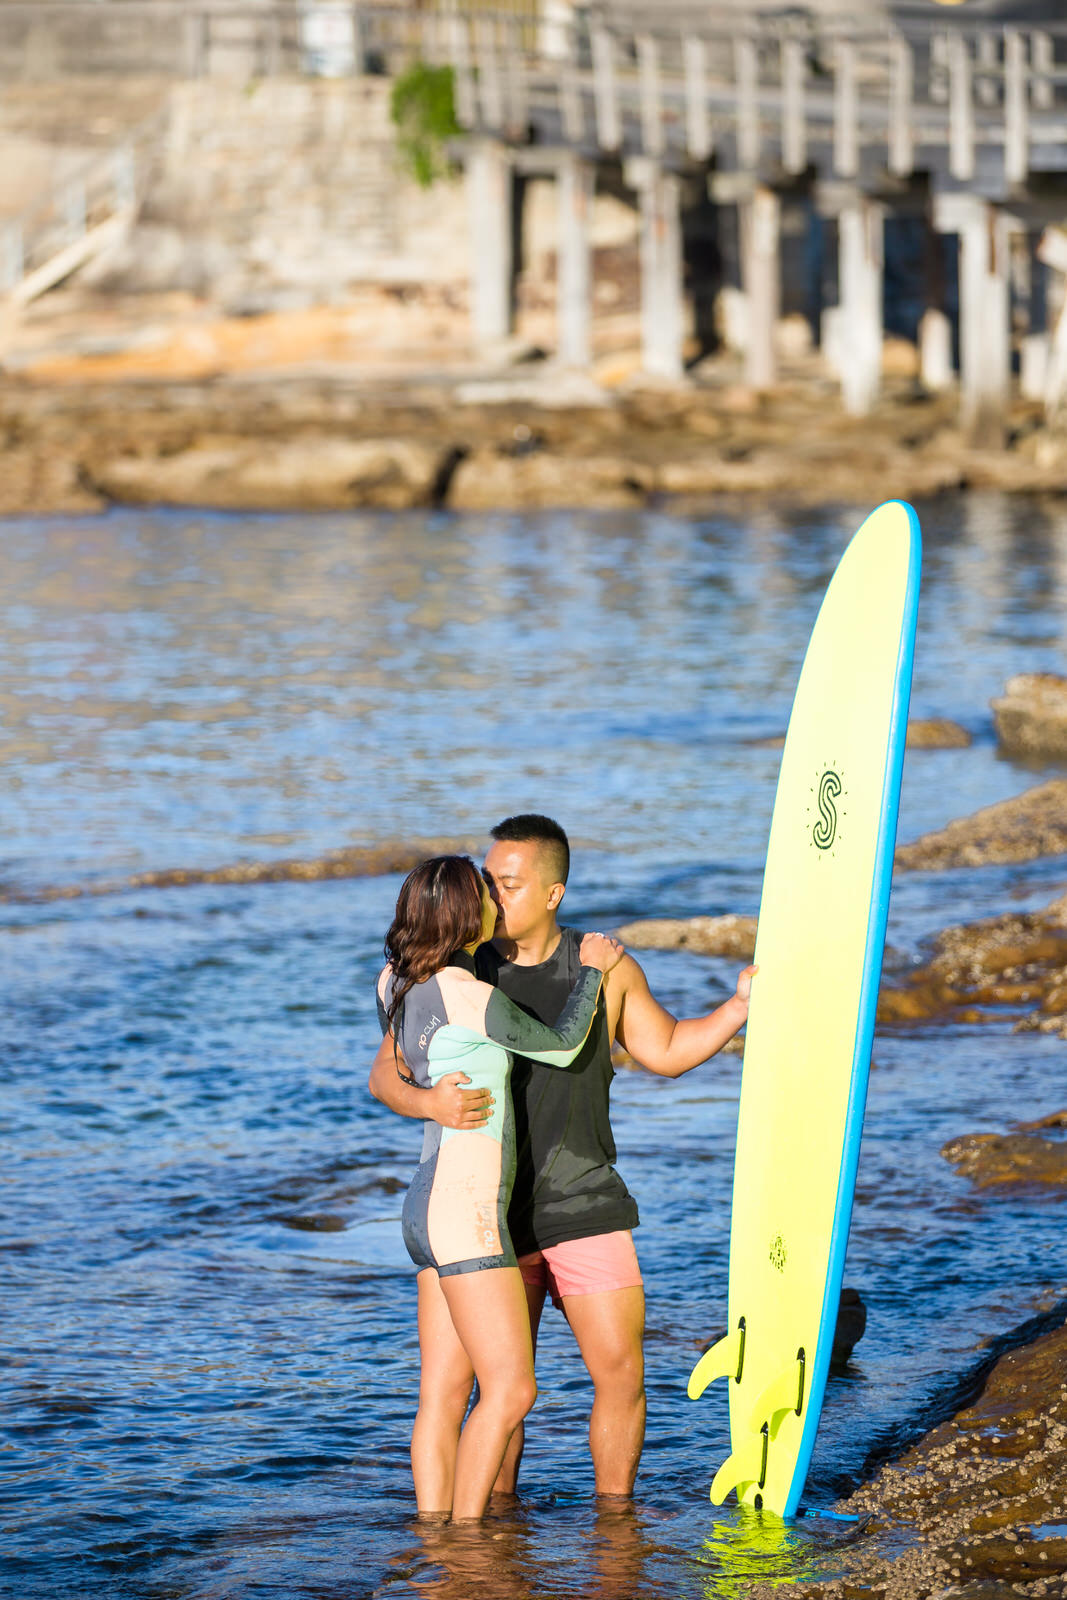 Sydney Engagement Pre-Wedding Photography Session - Jennifer Lam Photography - La Perouse (38).jpg